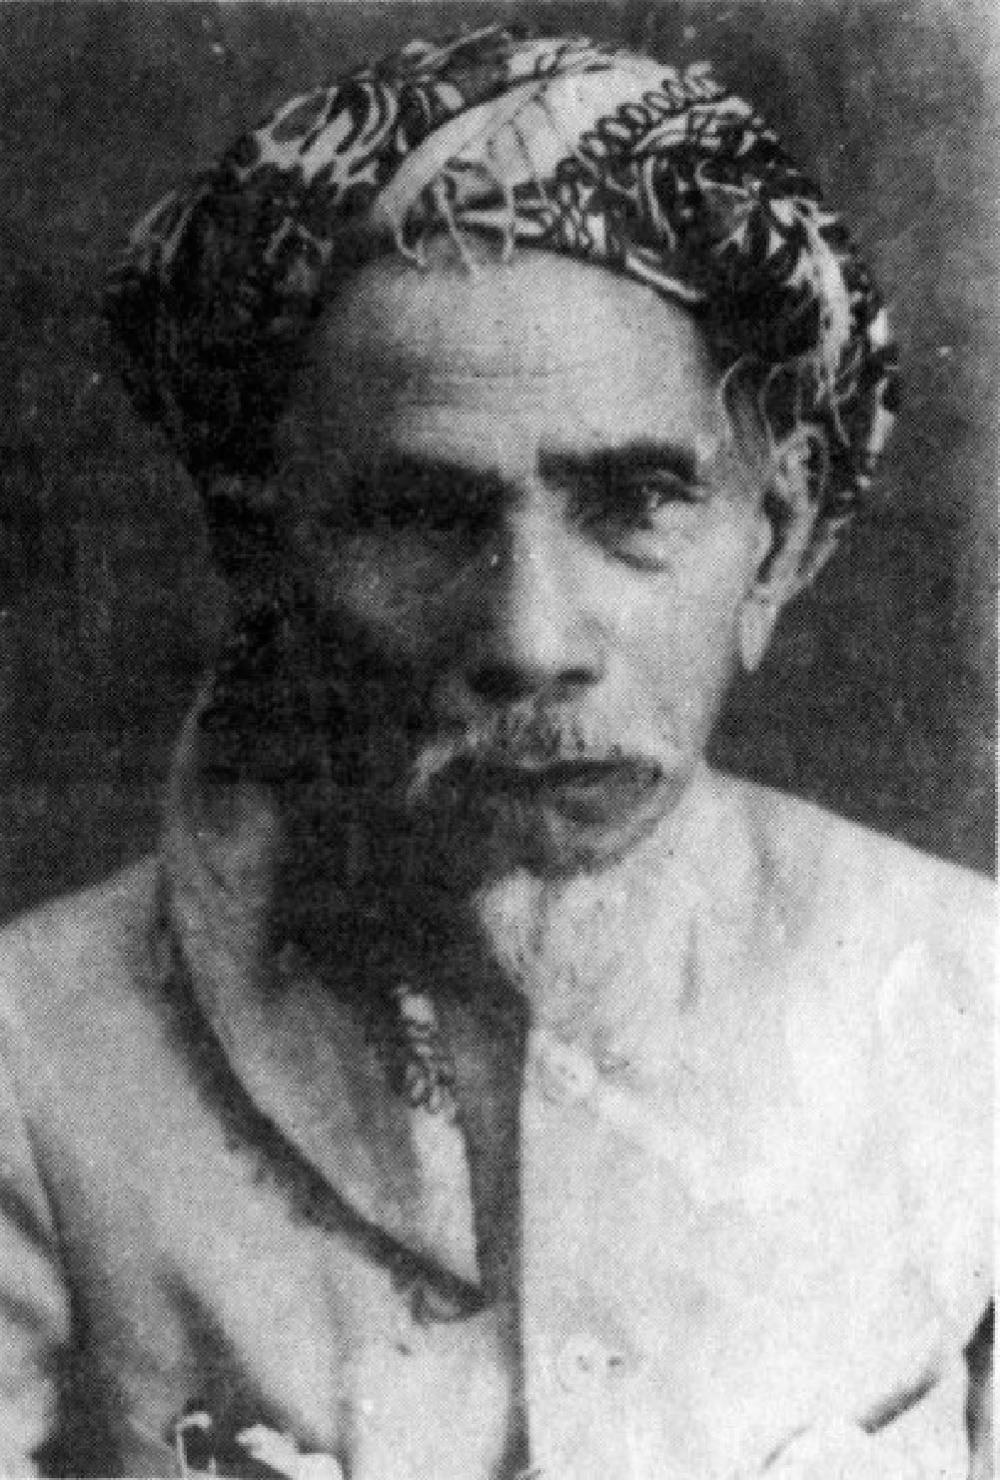 Syaikh-Ahmad-Khatib-Al-Minangkabawi